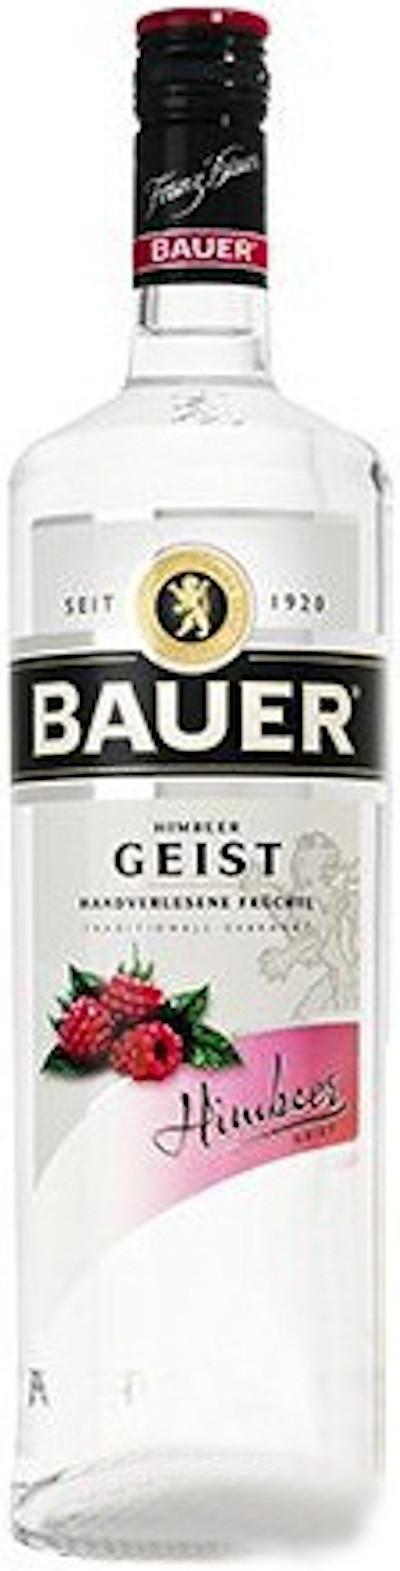 Bauer - Himbeergeist